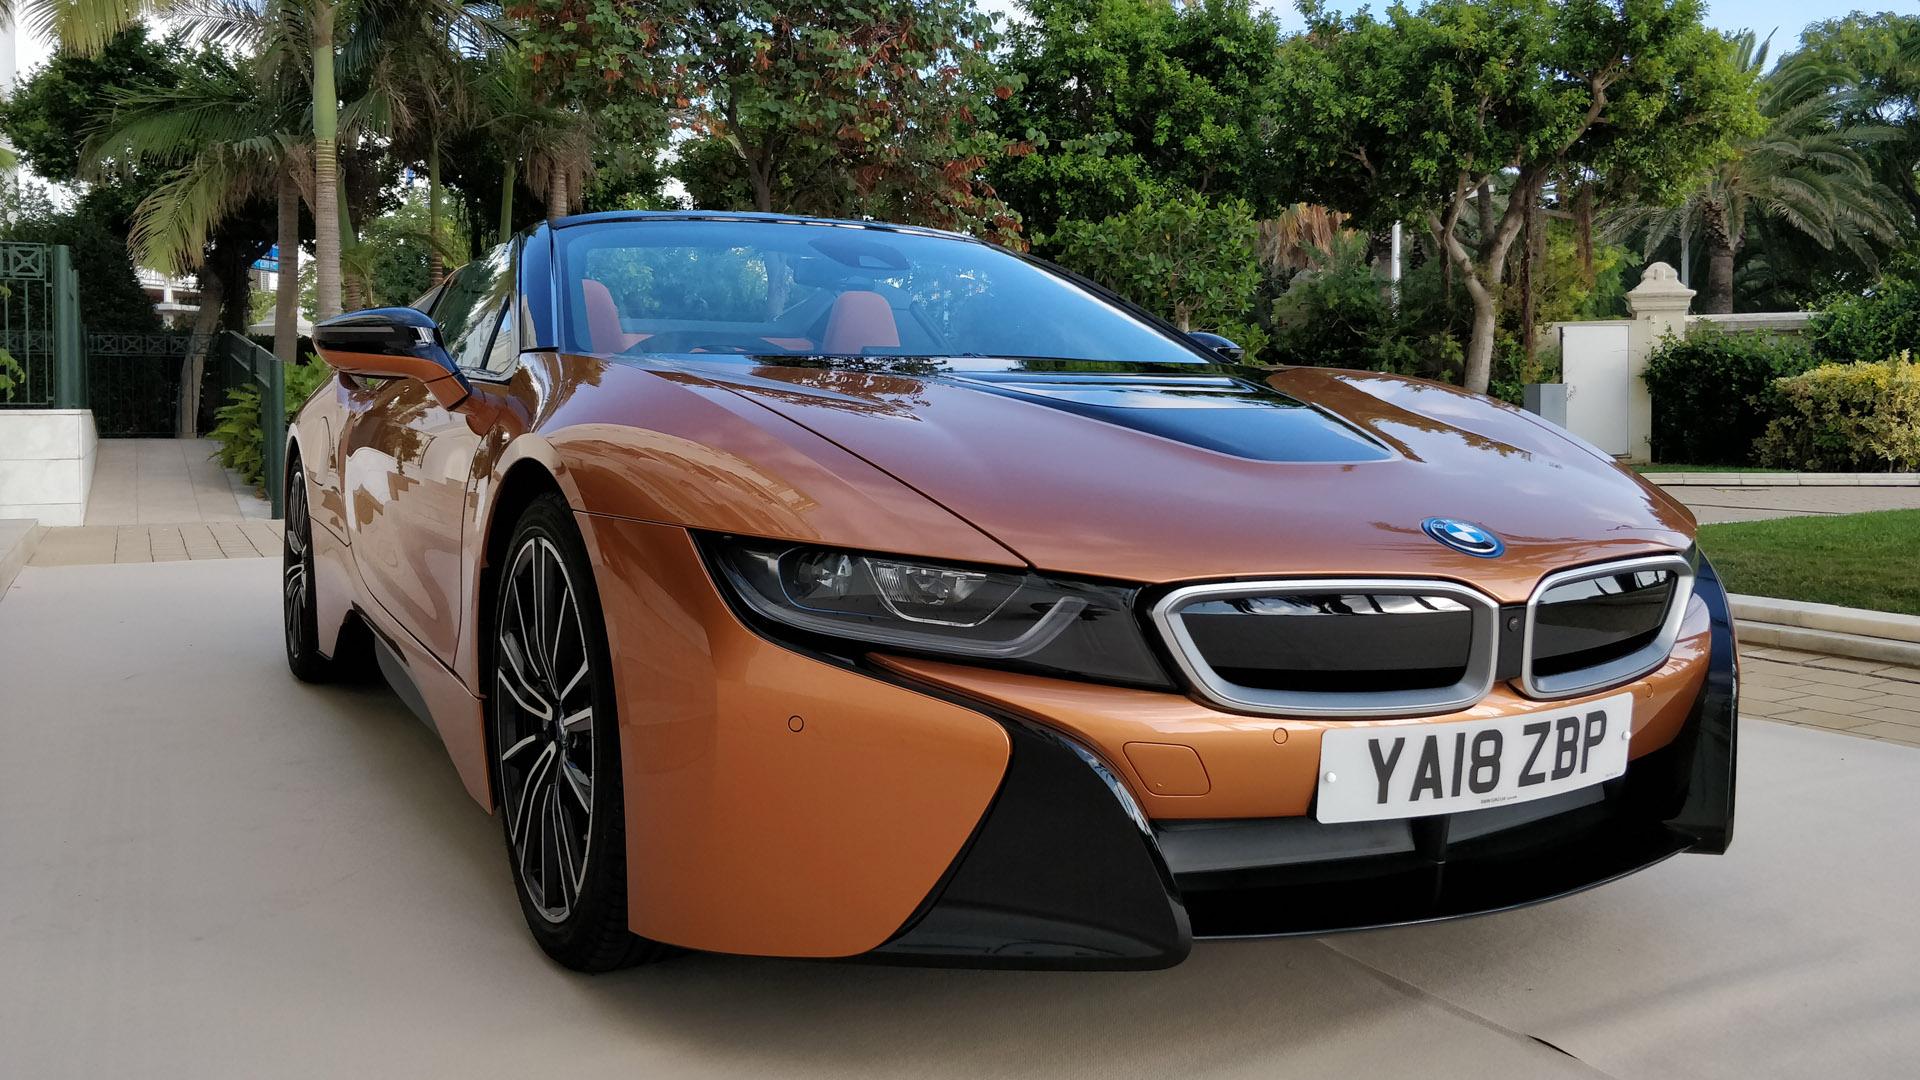 BMW i8 Roadster performance